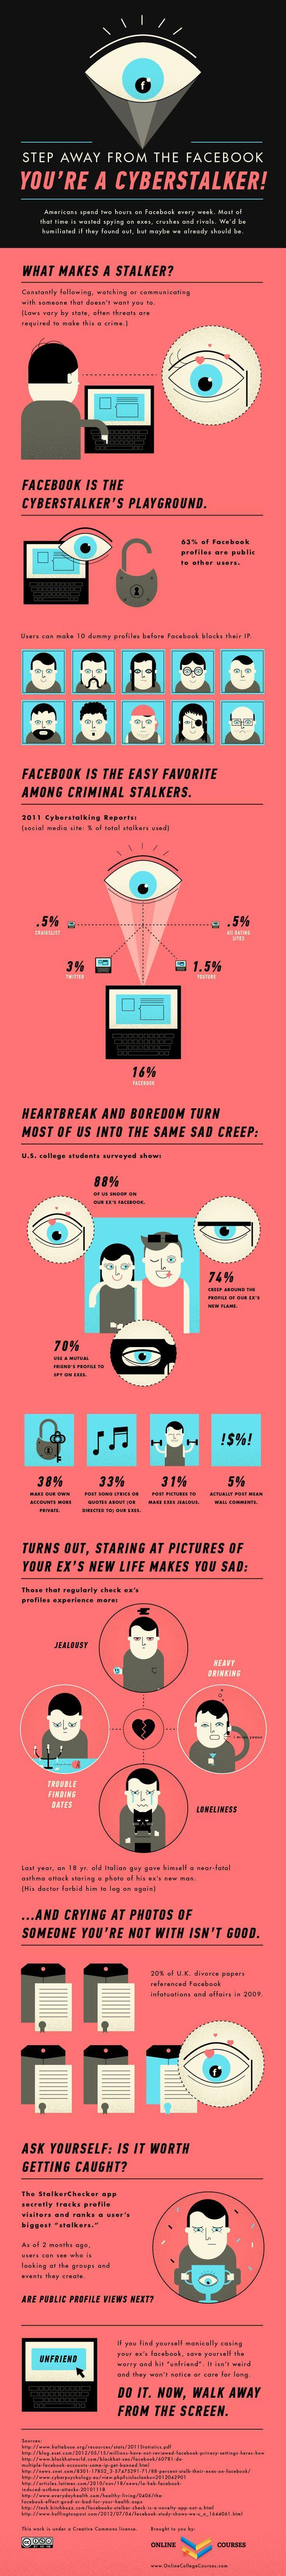 Drone Infographics : Facebook Stalking Statistics 2012